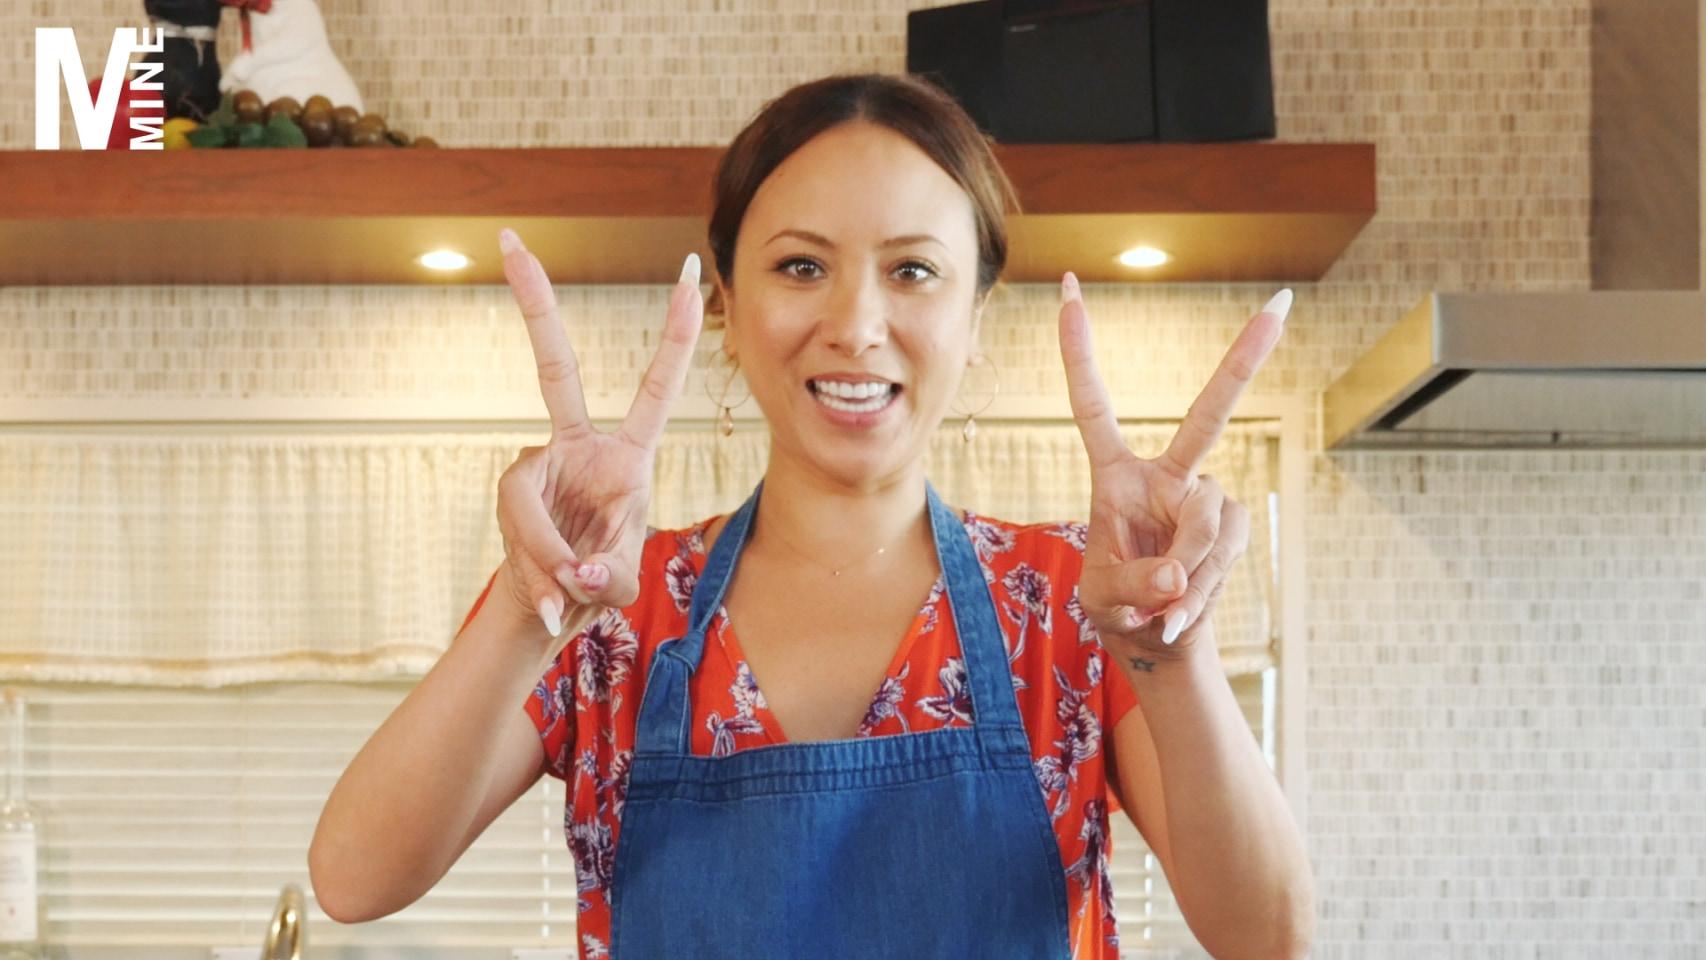 【Angelica Cooking!】夏のパーティーメニュー②『野菜サラダのテリーヌ風』